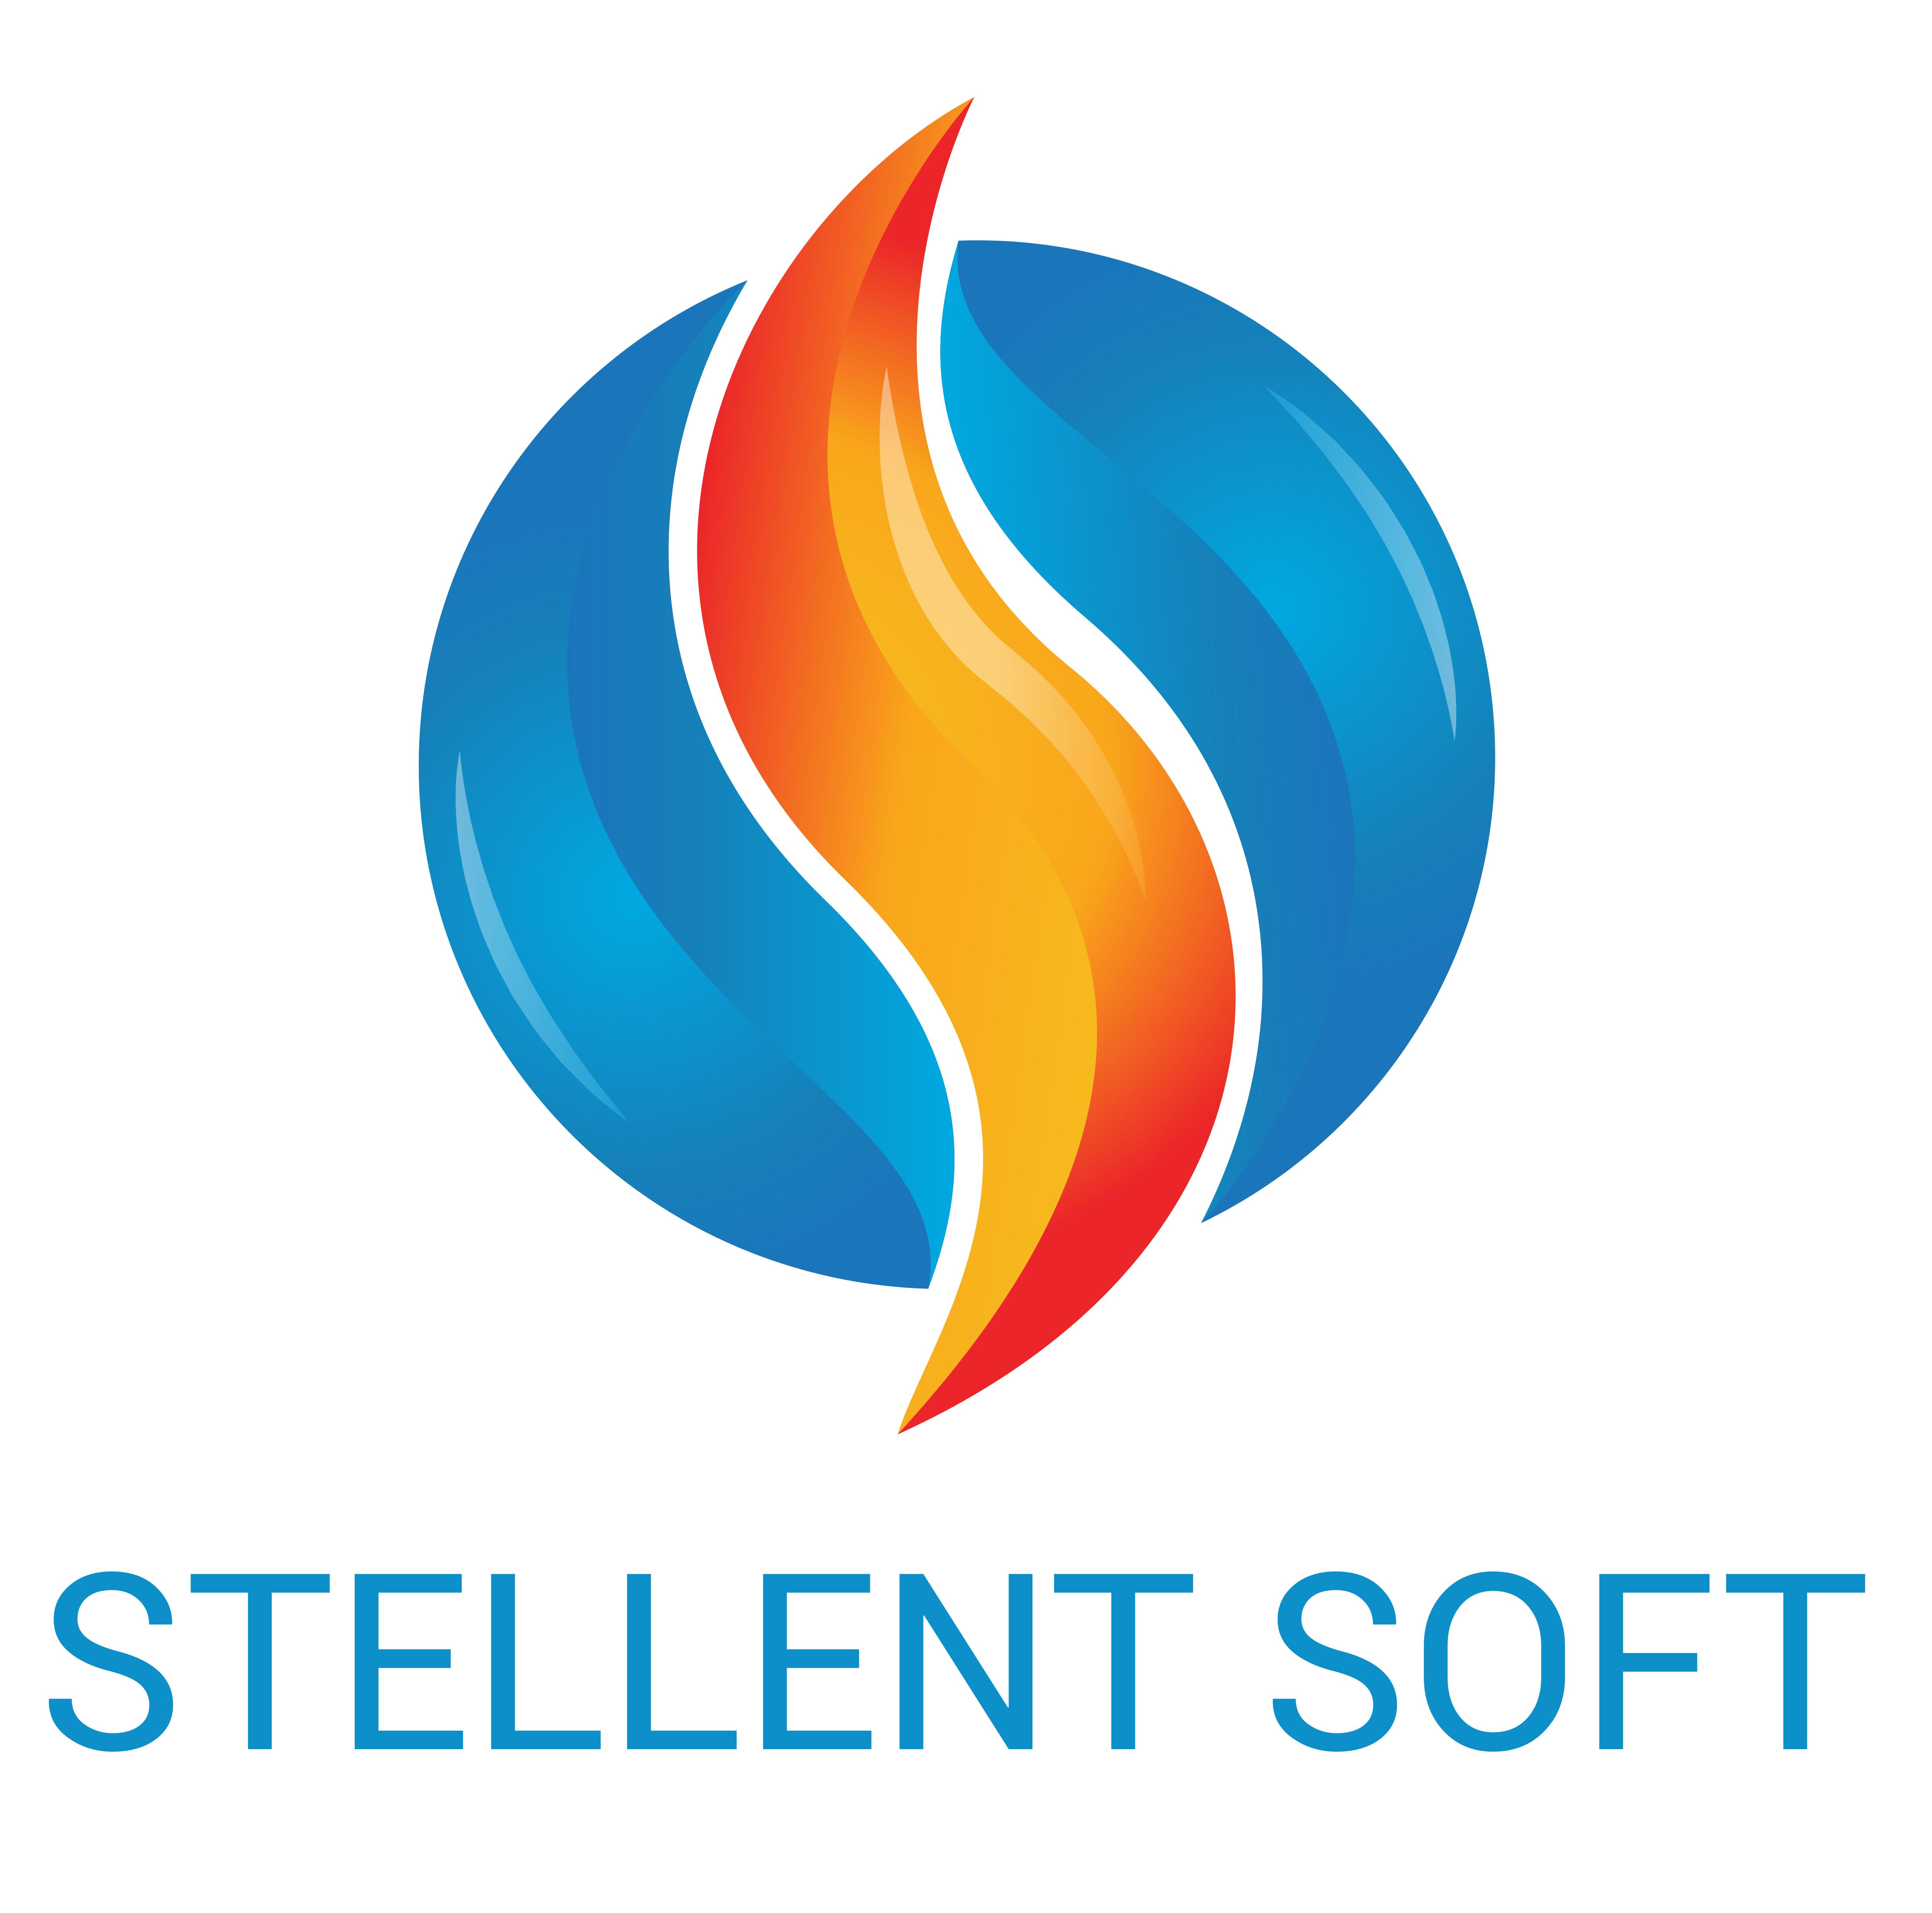 Stellent Soft logo